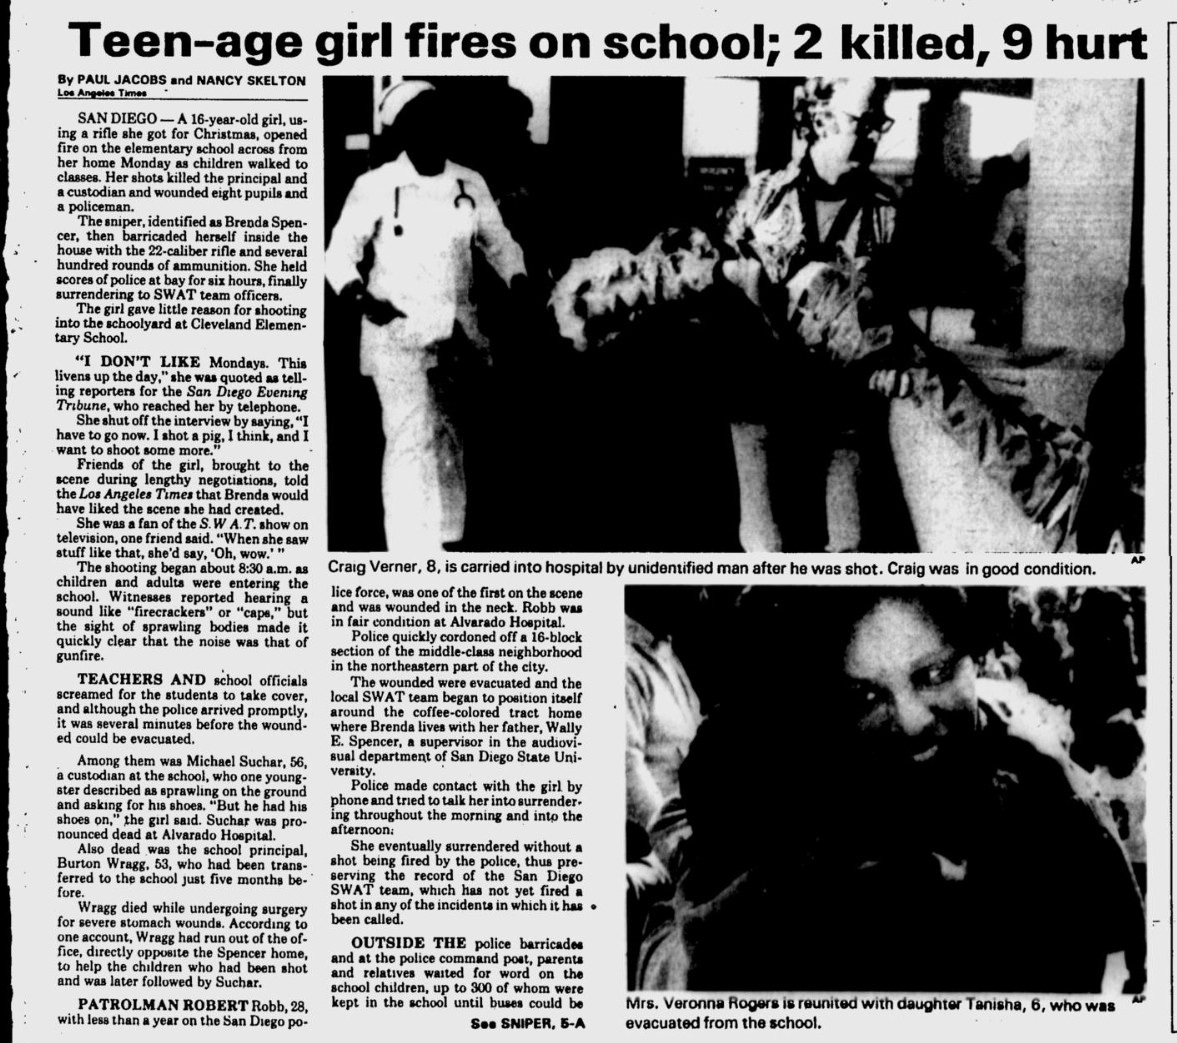 st-petersburg-times-january-30-1979